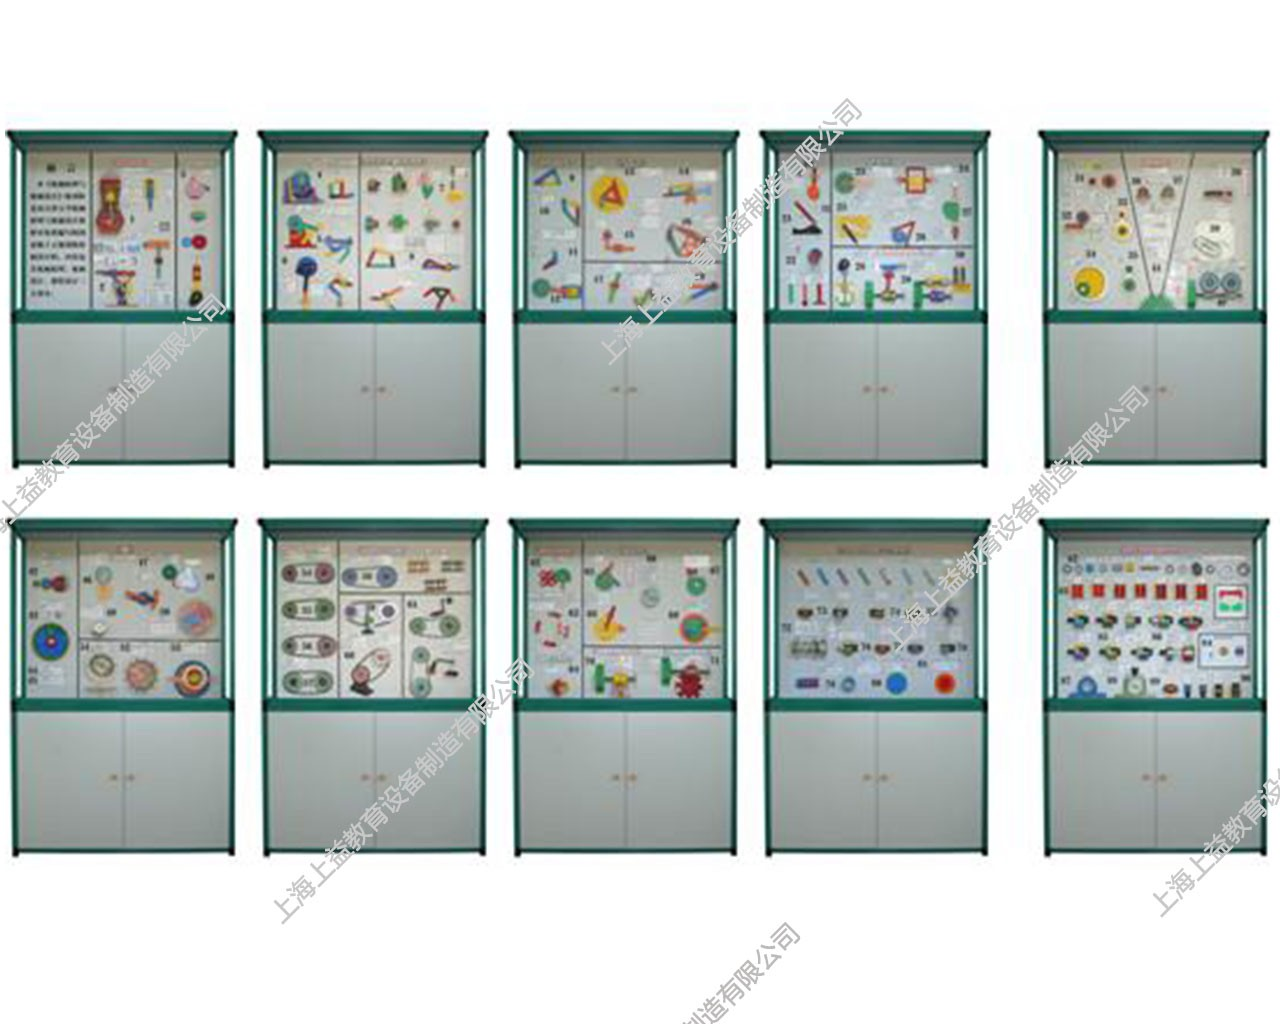 SYGLG-106 多媒体智能控制《机械原理与机械设计》陈列柜